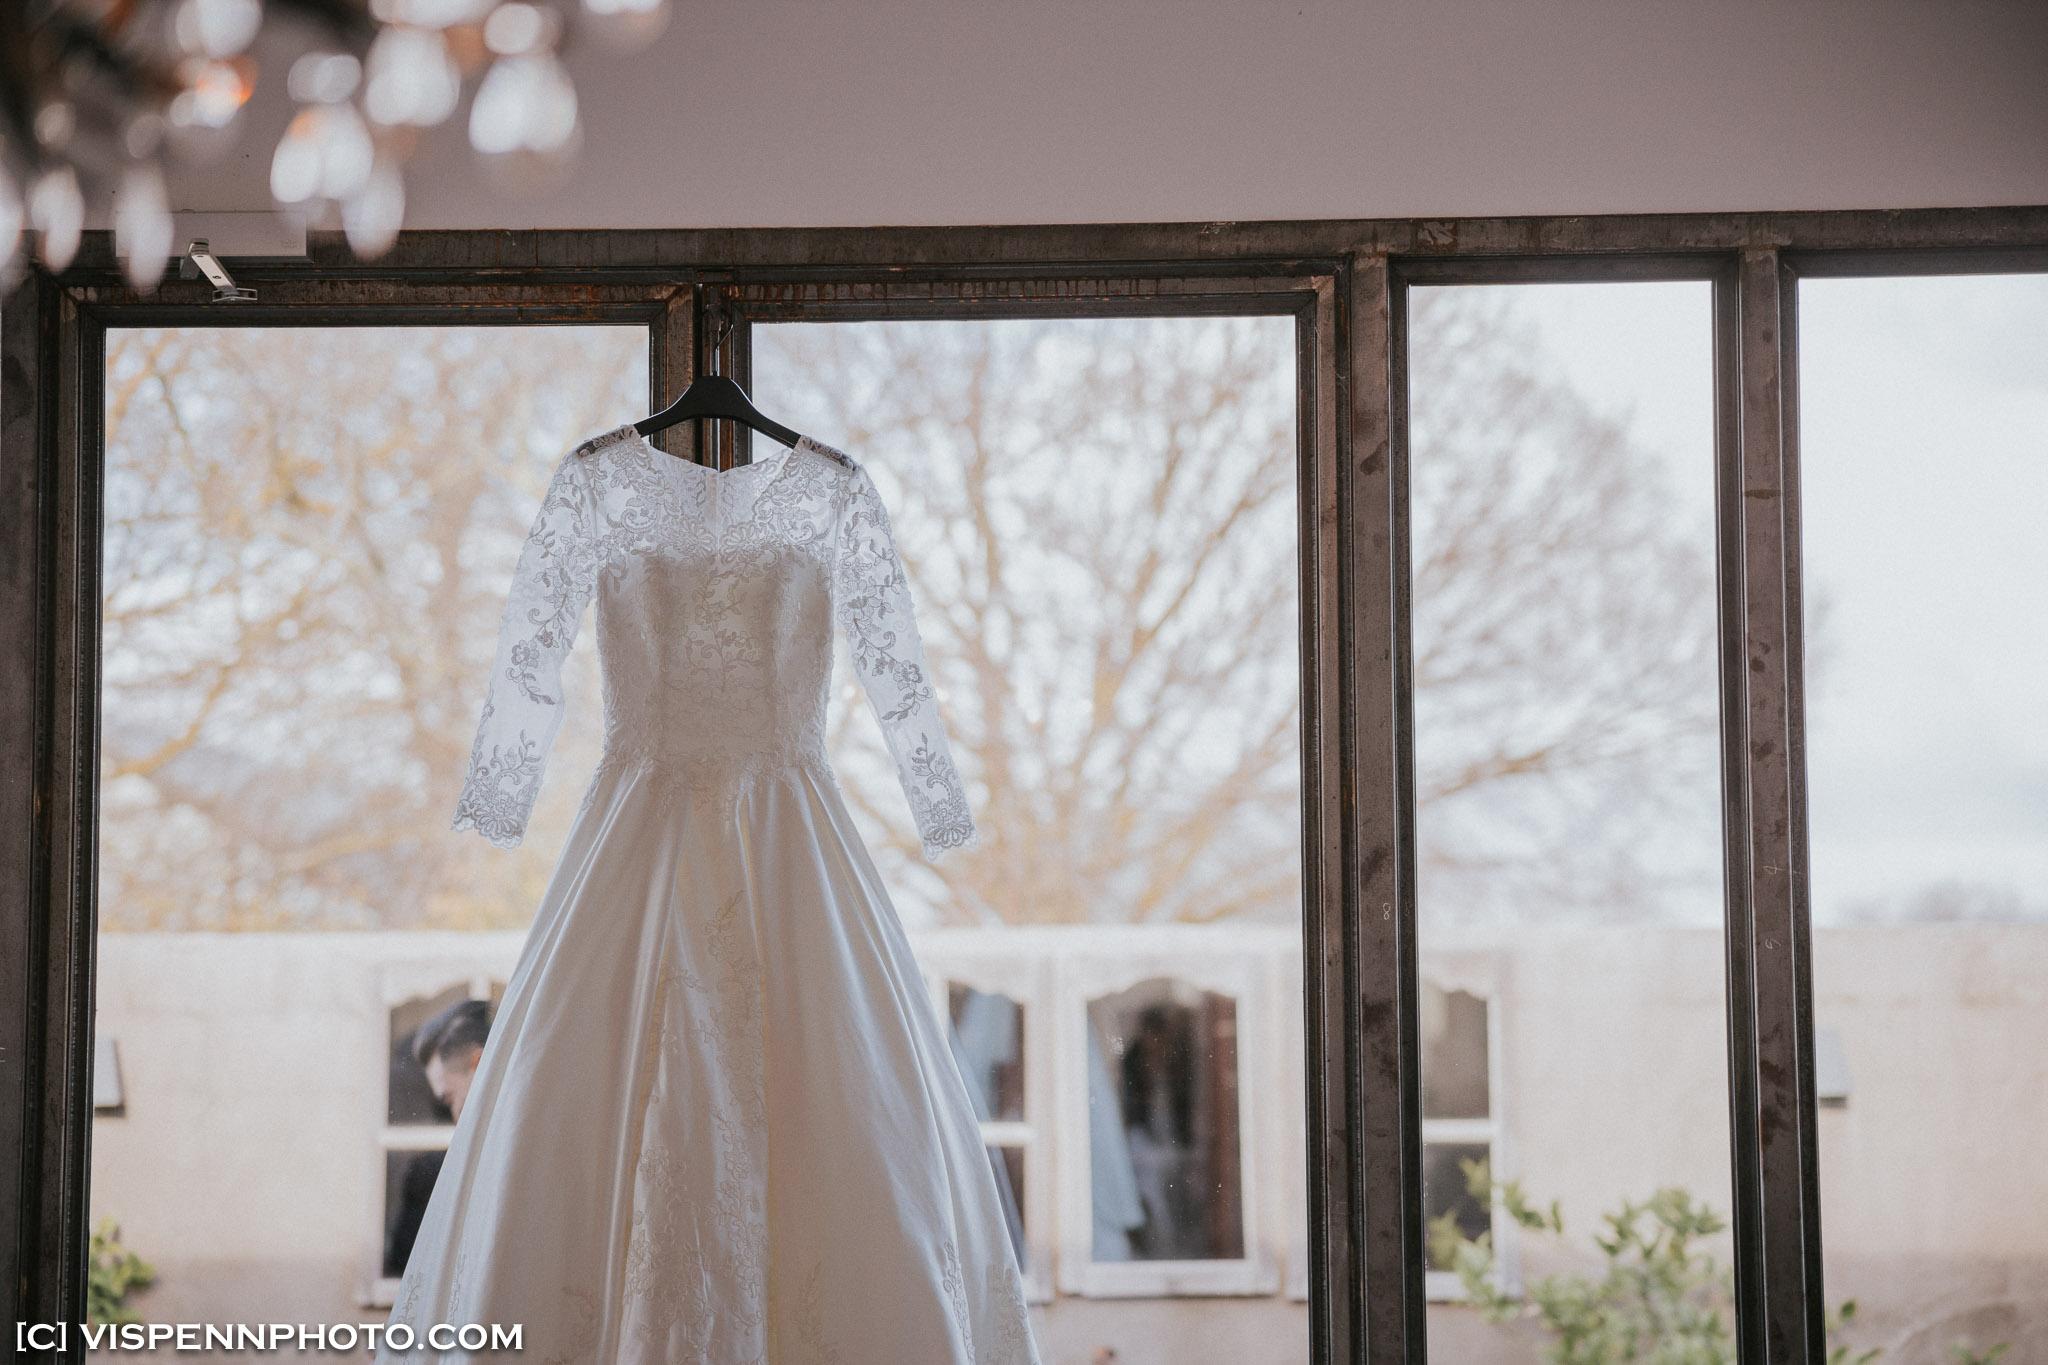 WEDDING DAY Photography Melbourne CoreyCoco 1P 00051 EOSR ZHPENN